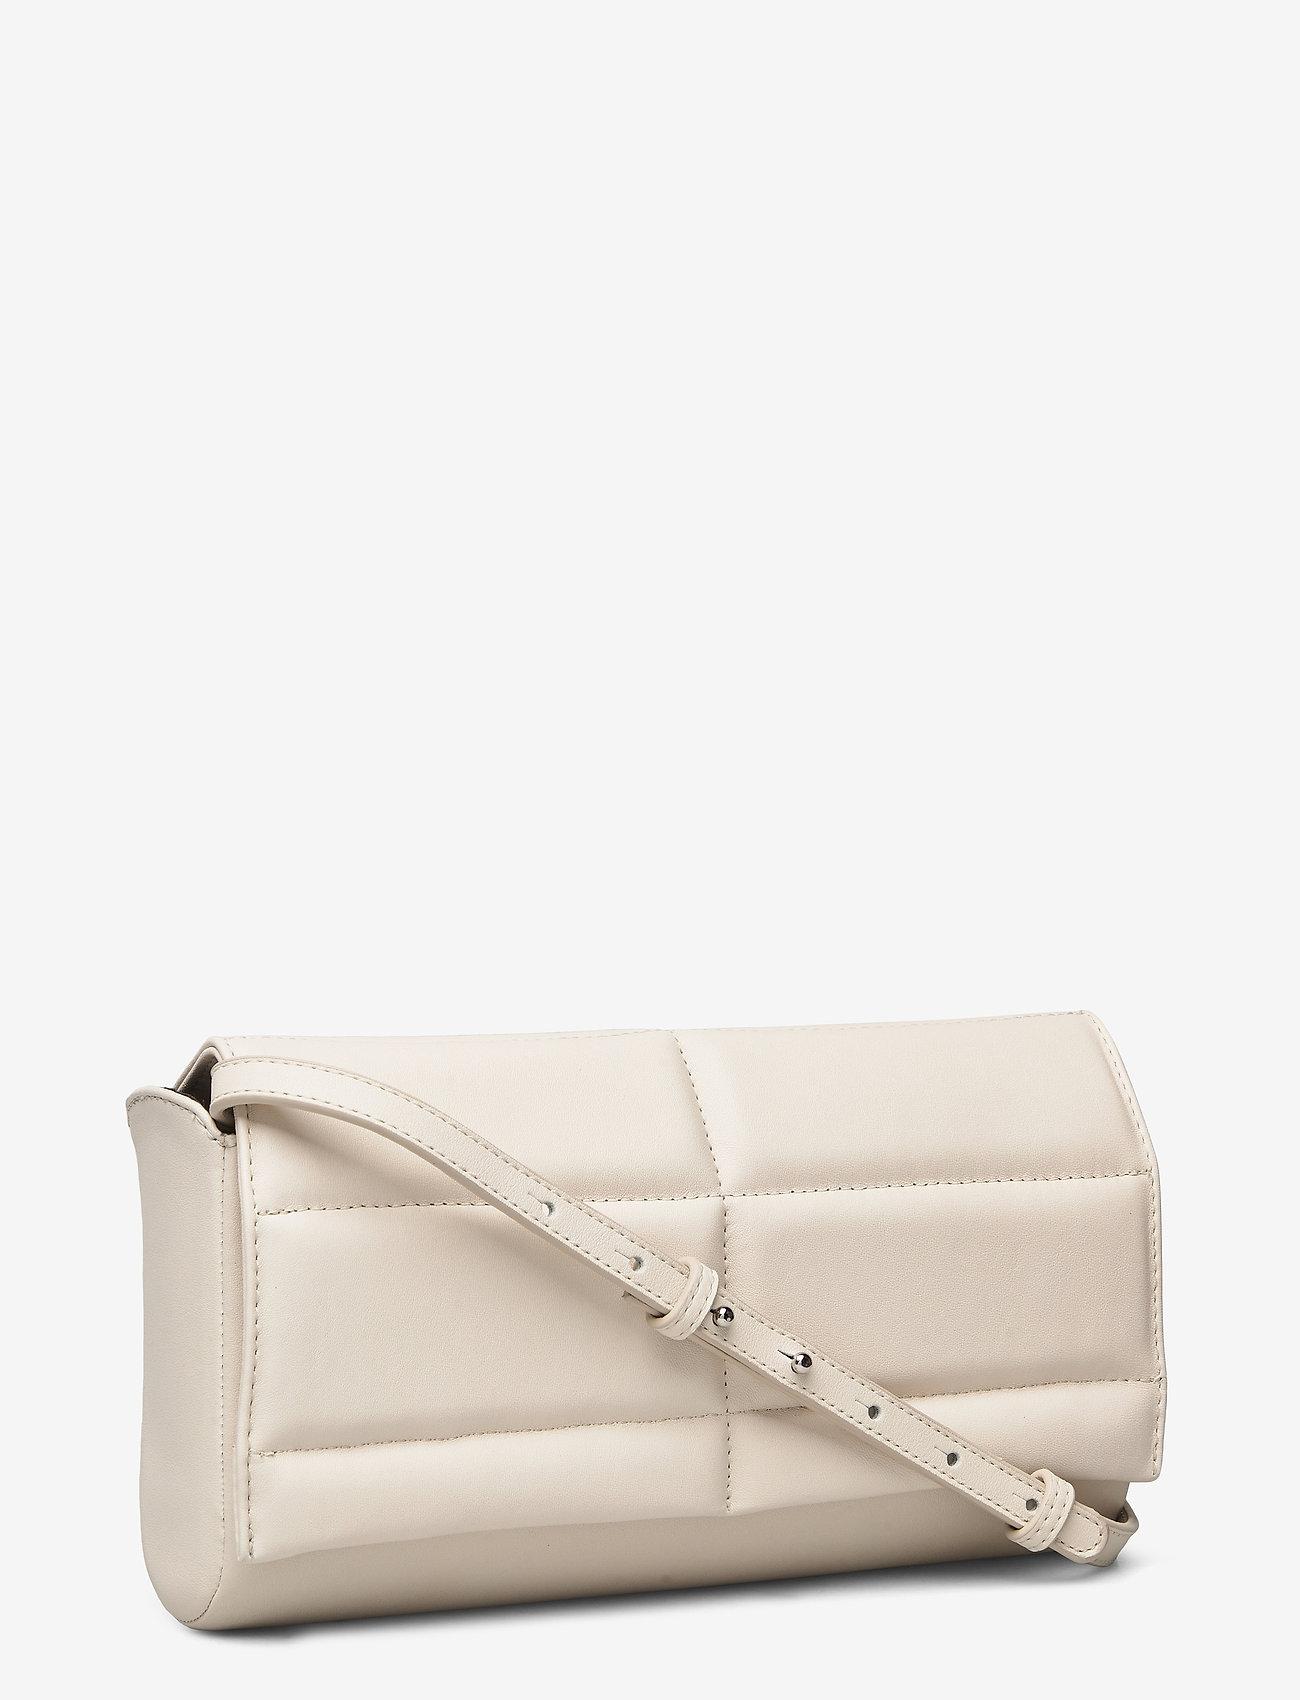 VAGABOND - MALIBU - crossbody bags - off white - 2